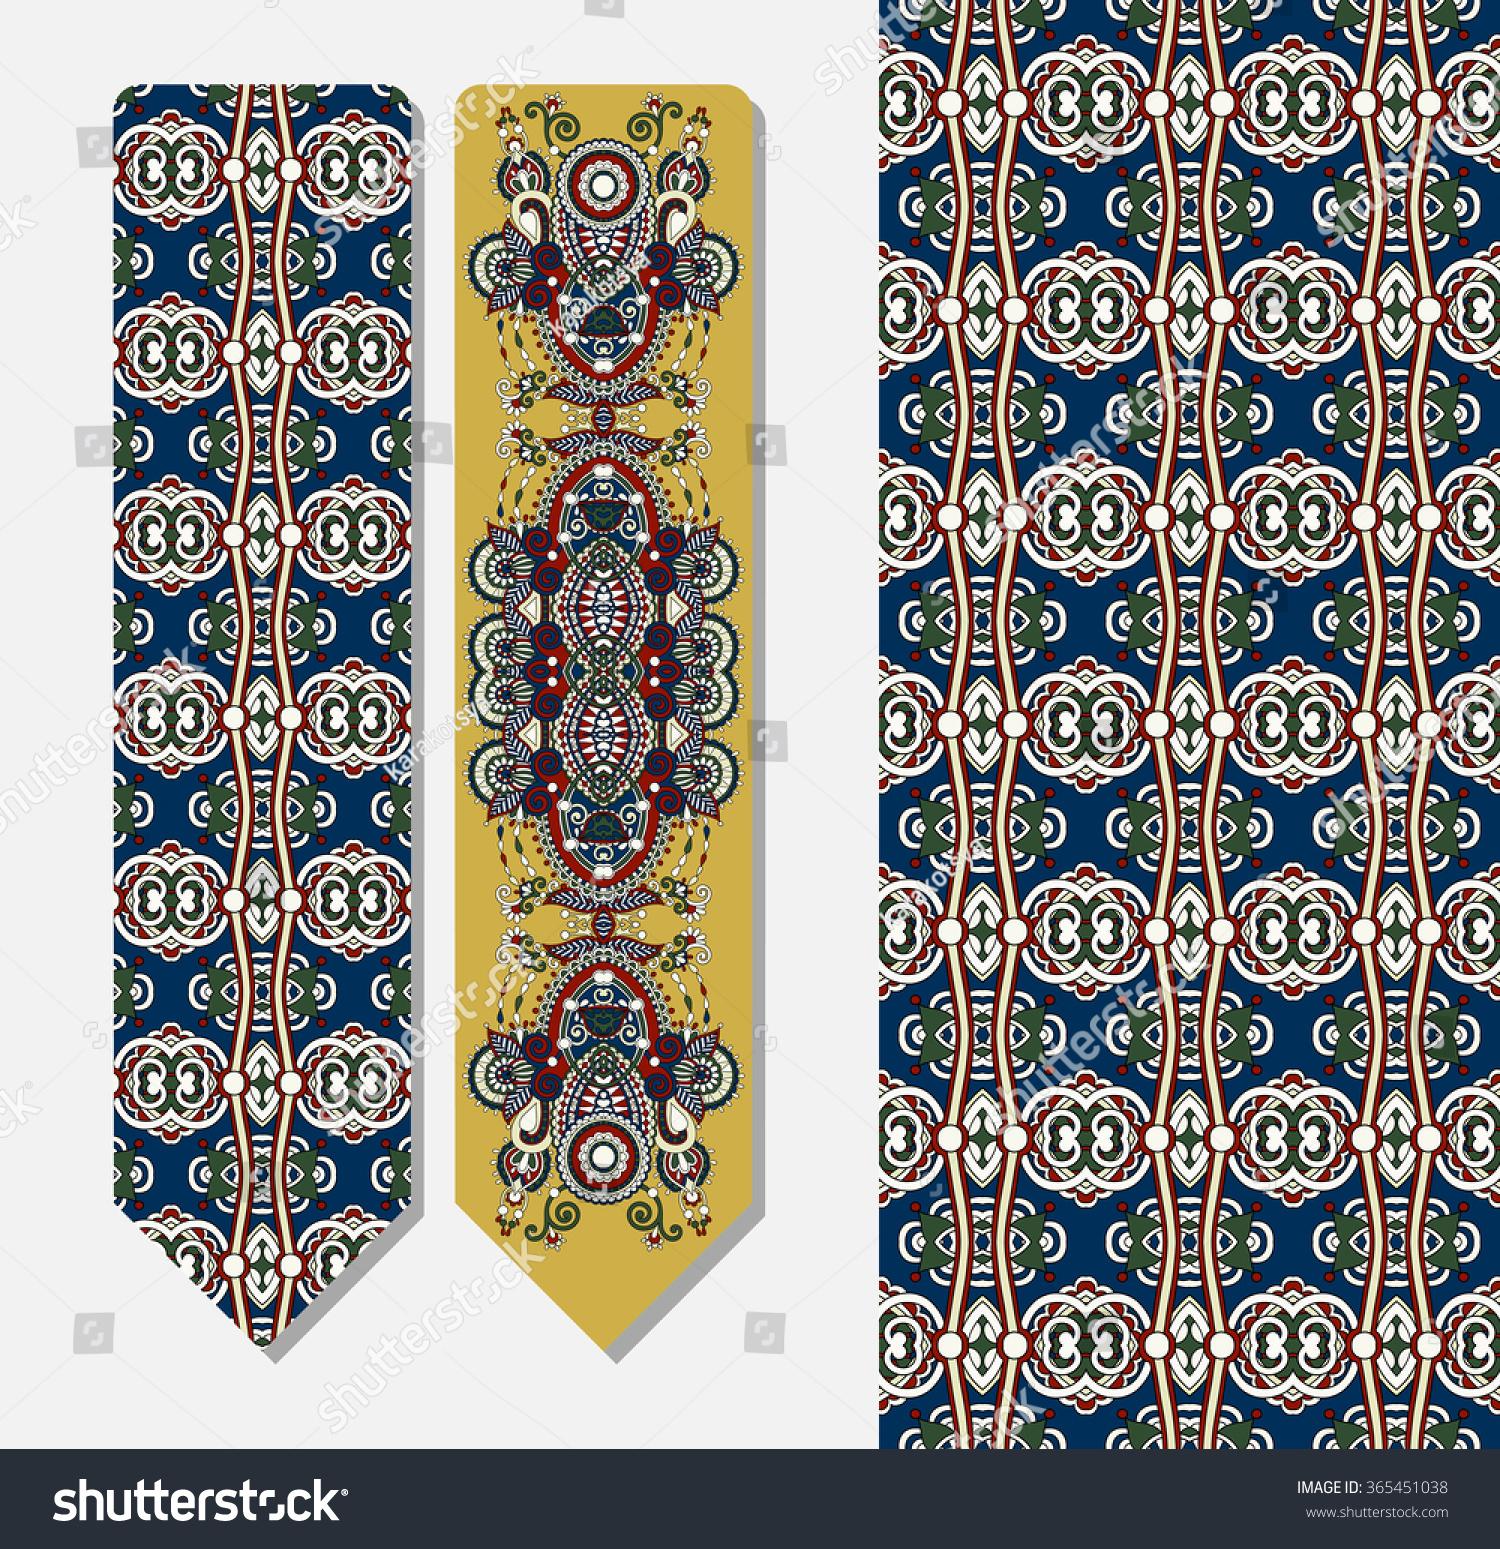 Floral Decorative Ethnic Paisley Bookmark Printing Stock ...